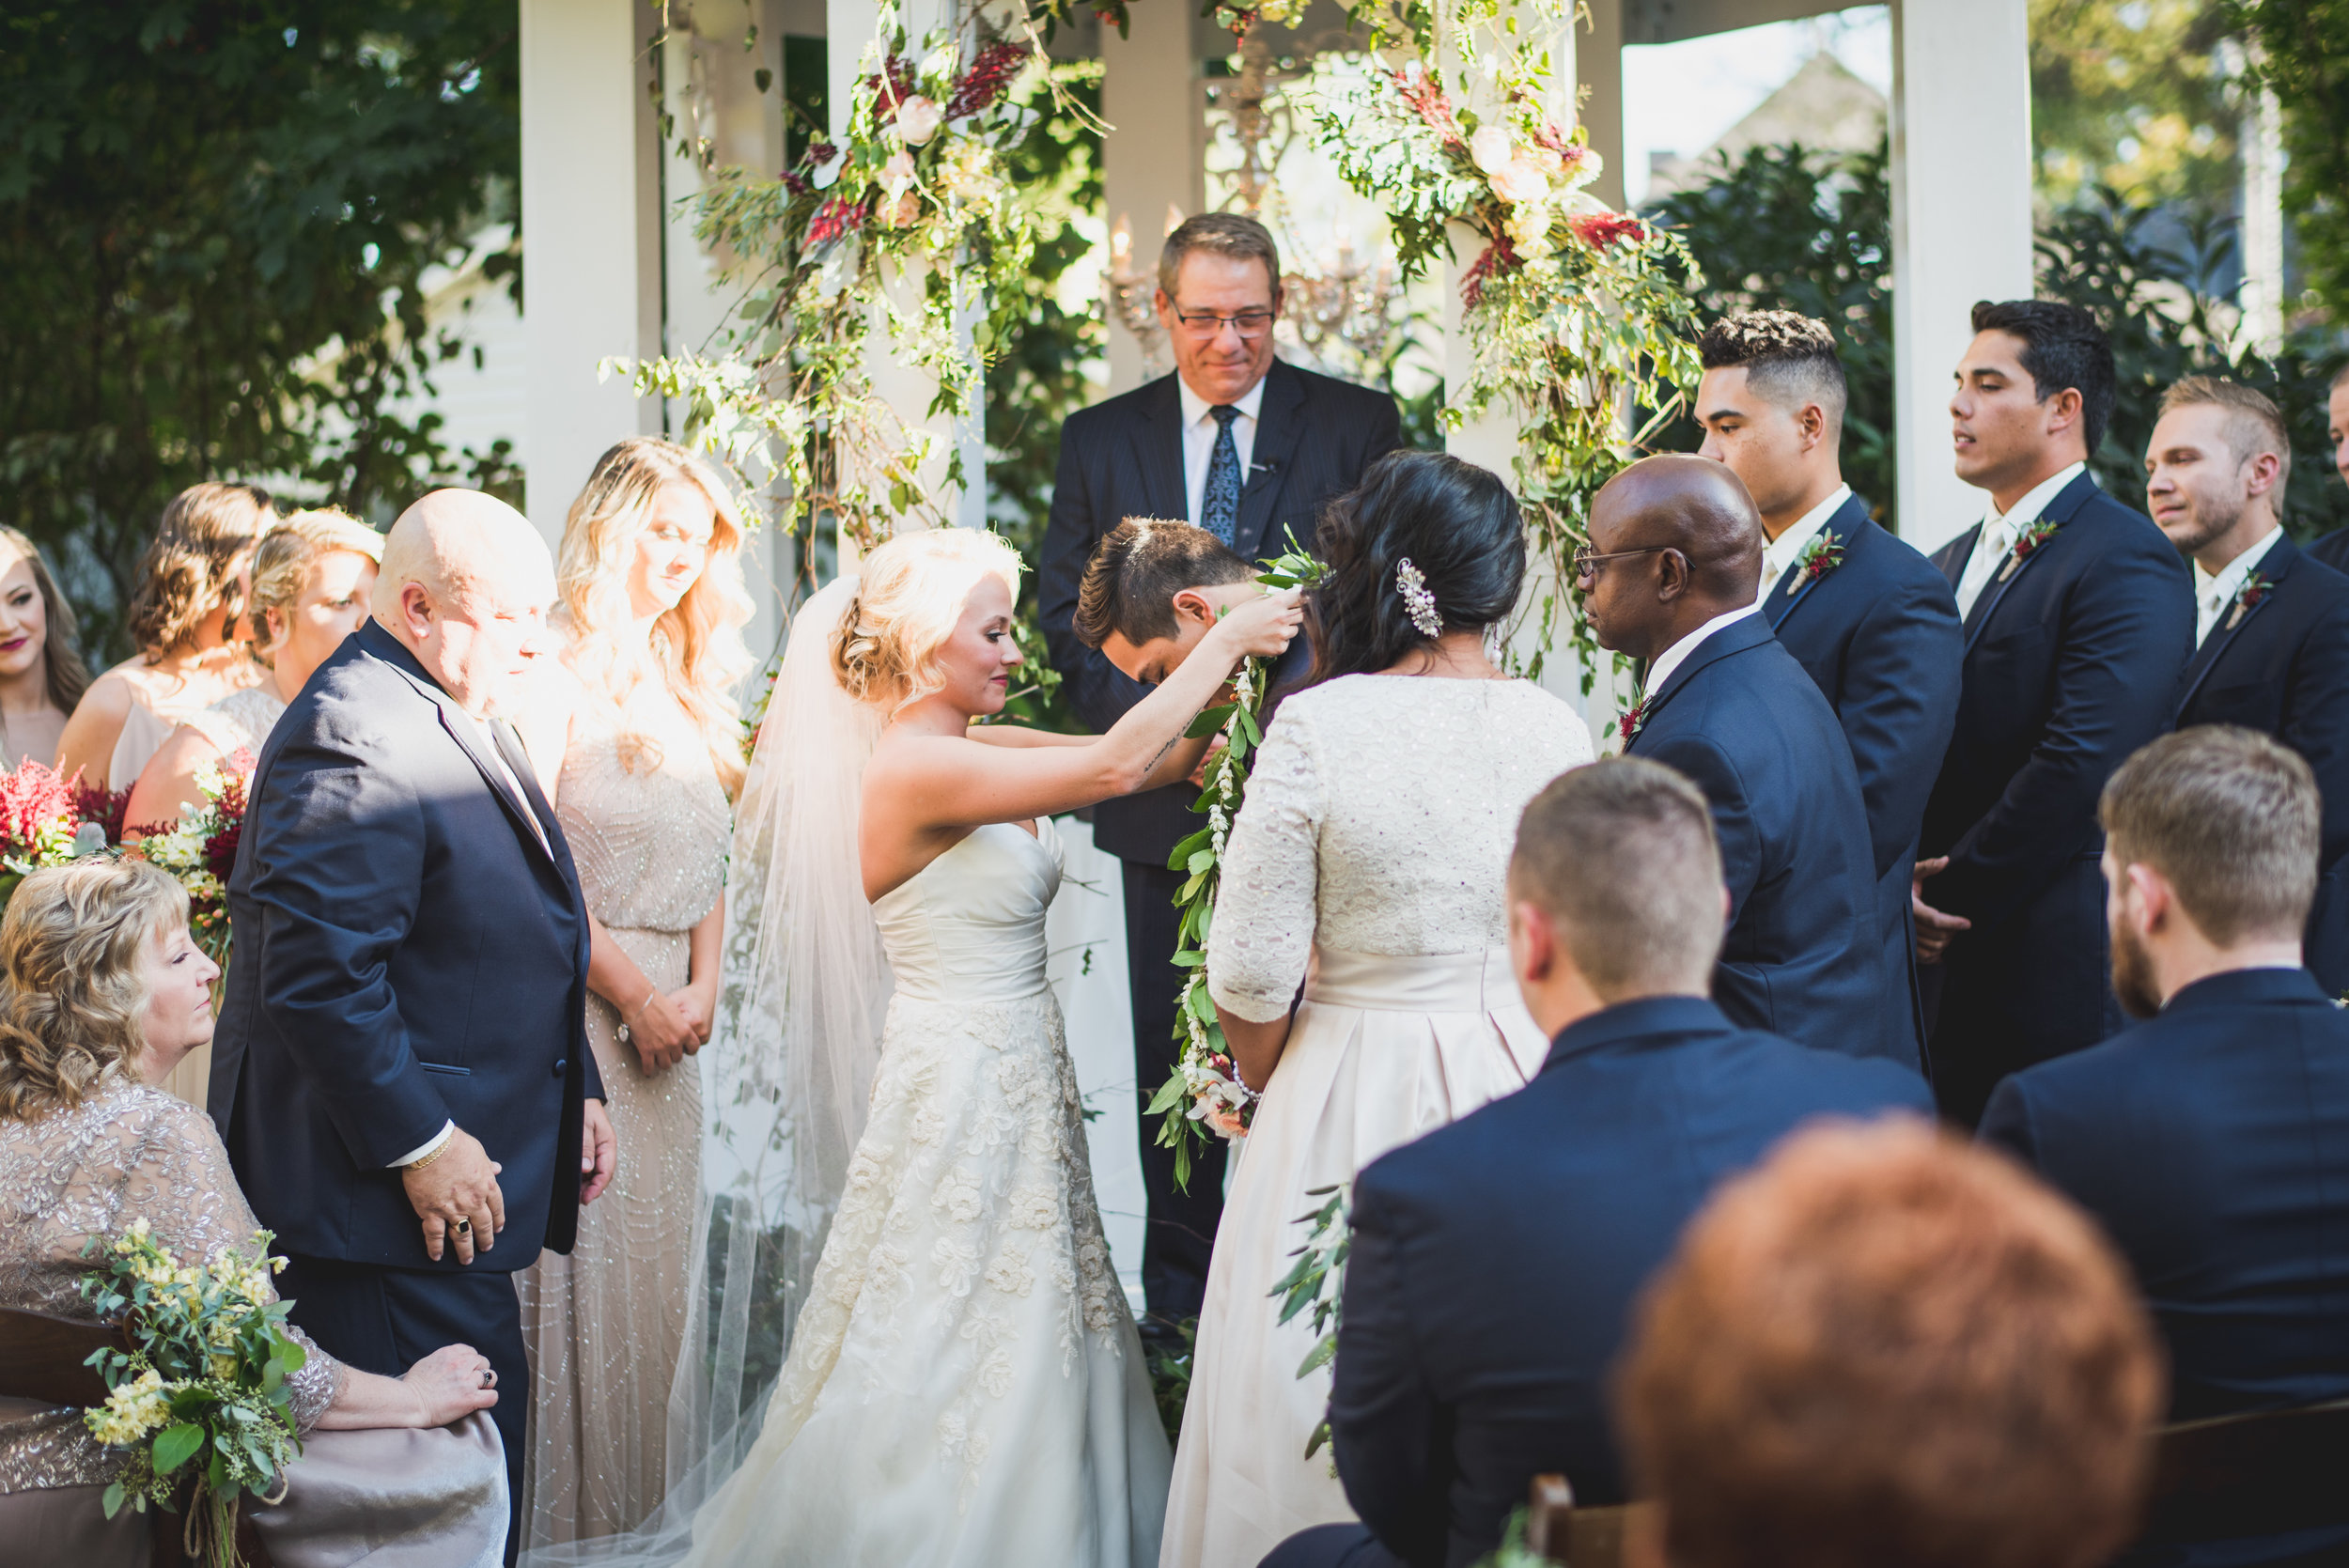 Nashville-wedding-photographers-CJ's-Off-The-Square-30.JPG